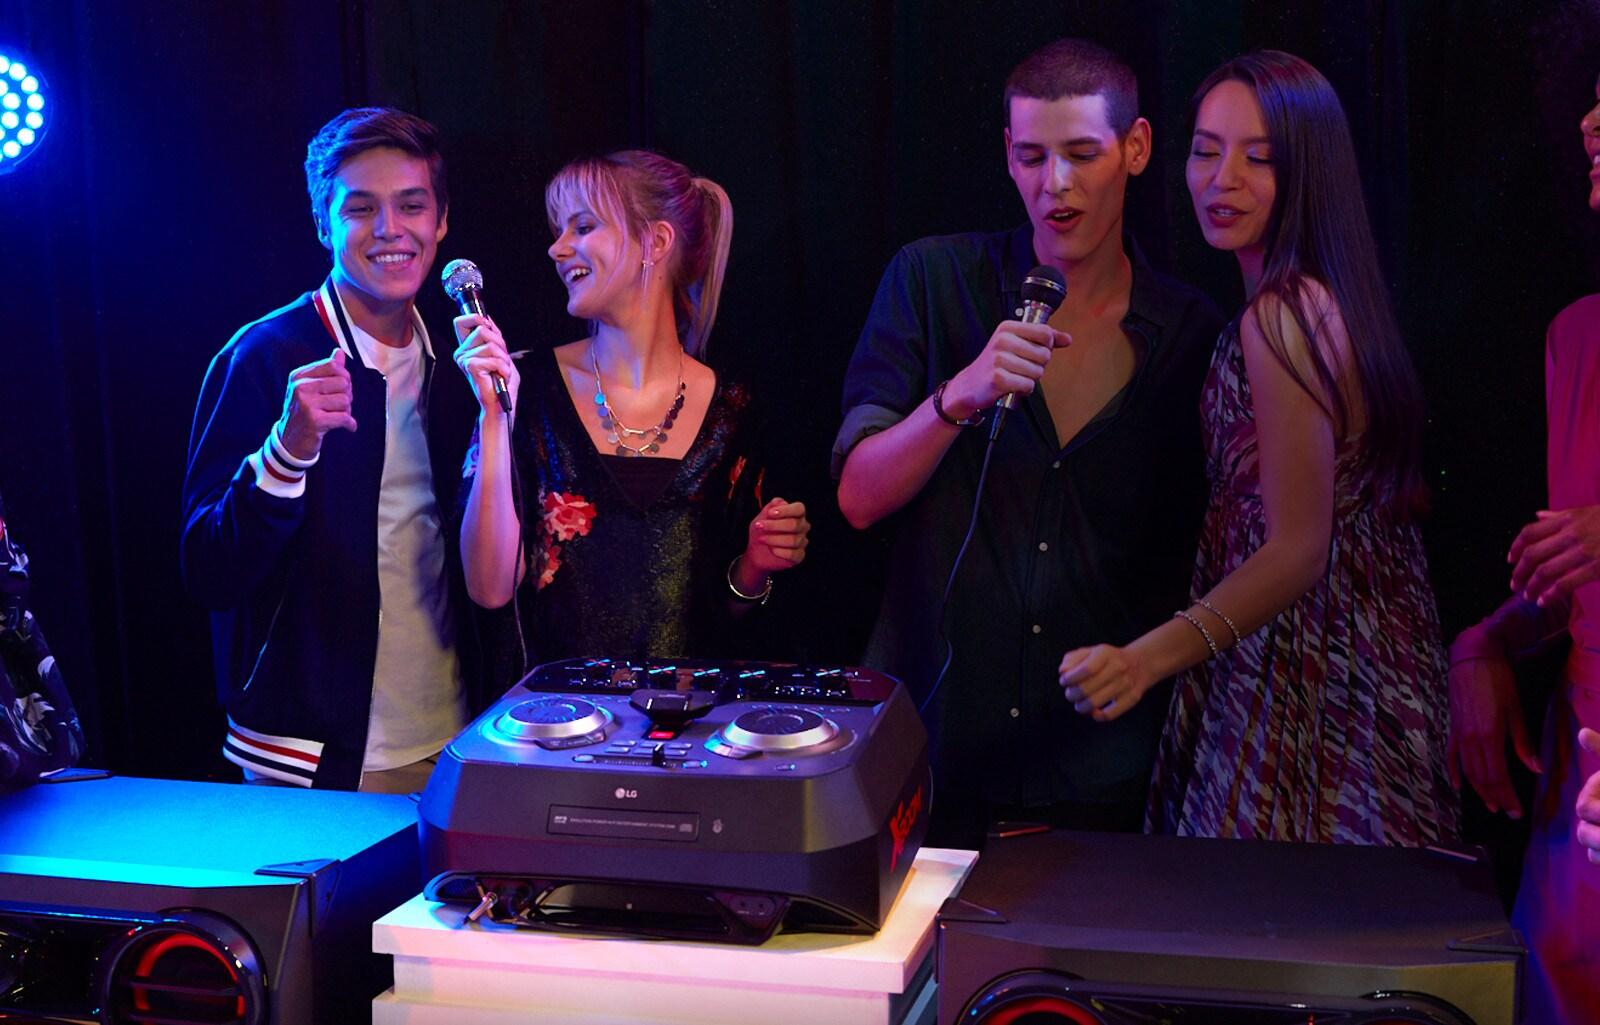 08_CK99_Showcase_Your_Singing_Talents_with_Karaoke_Star_Desktop